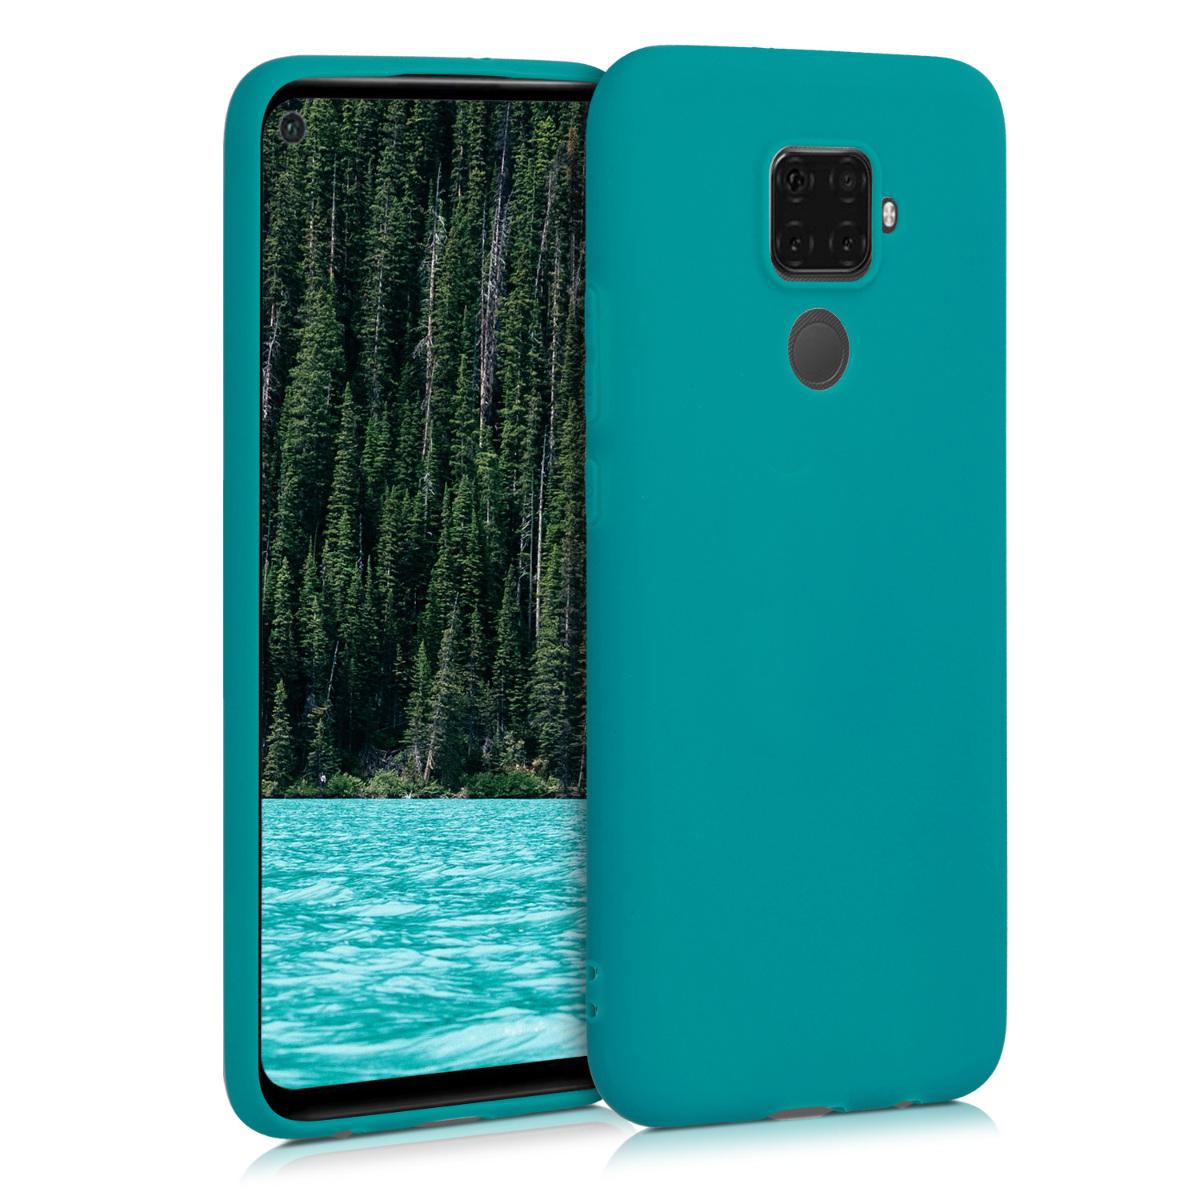 KW Θήκη Σιλικόνης Huawei Mate 30 Lite - Teal Matte (50153.57)